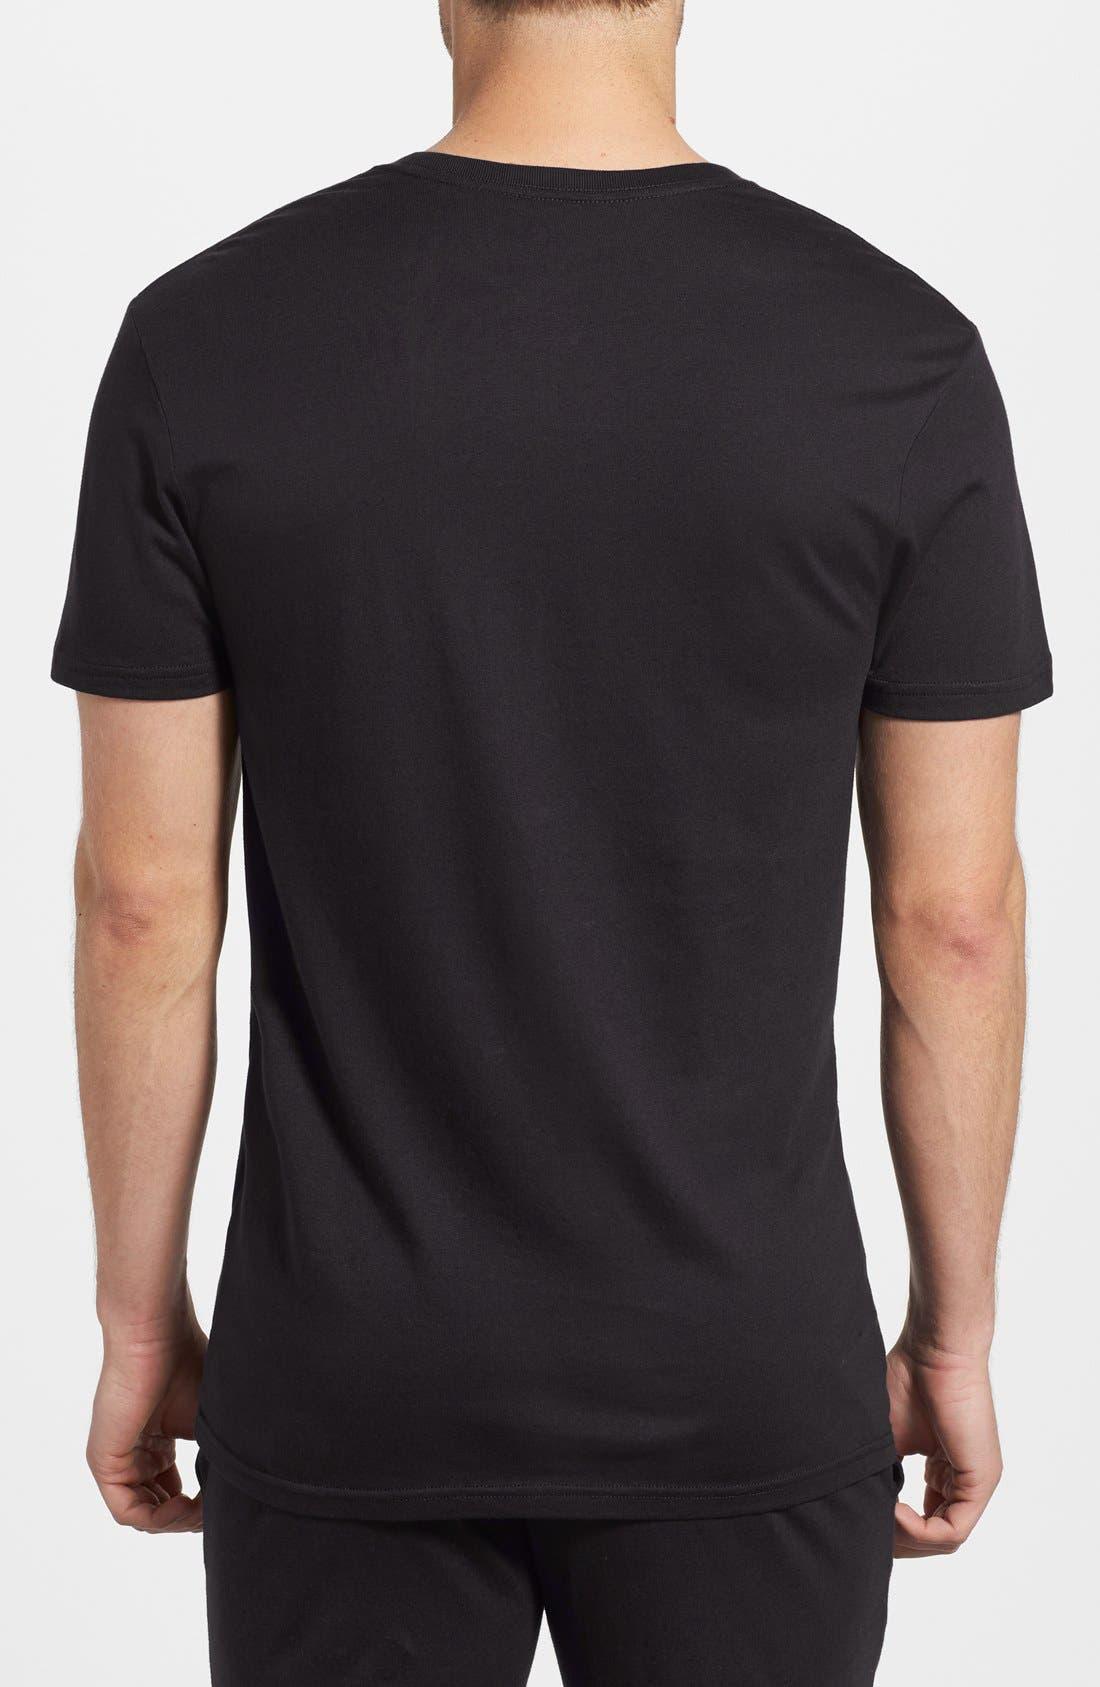 POLO RALPH LAUREN,                             Crewneck T-Shirt,                             Alternate thumbnail 2, color,                             POLO BLACK